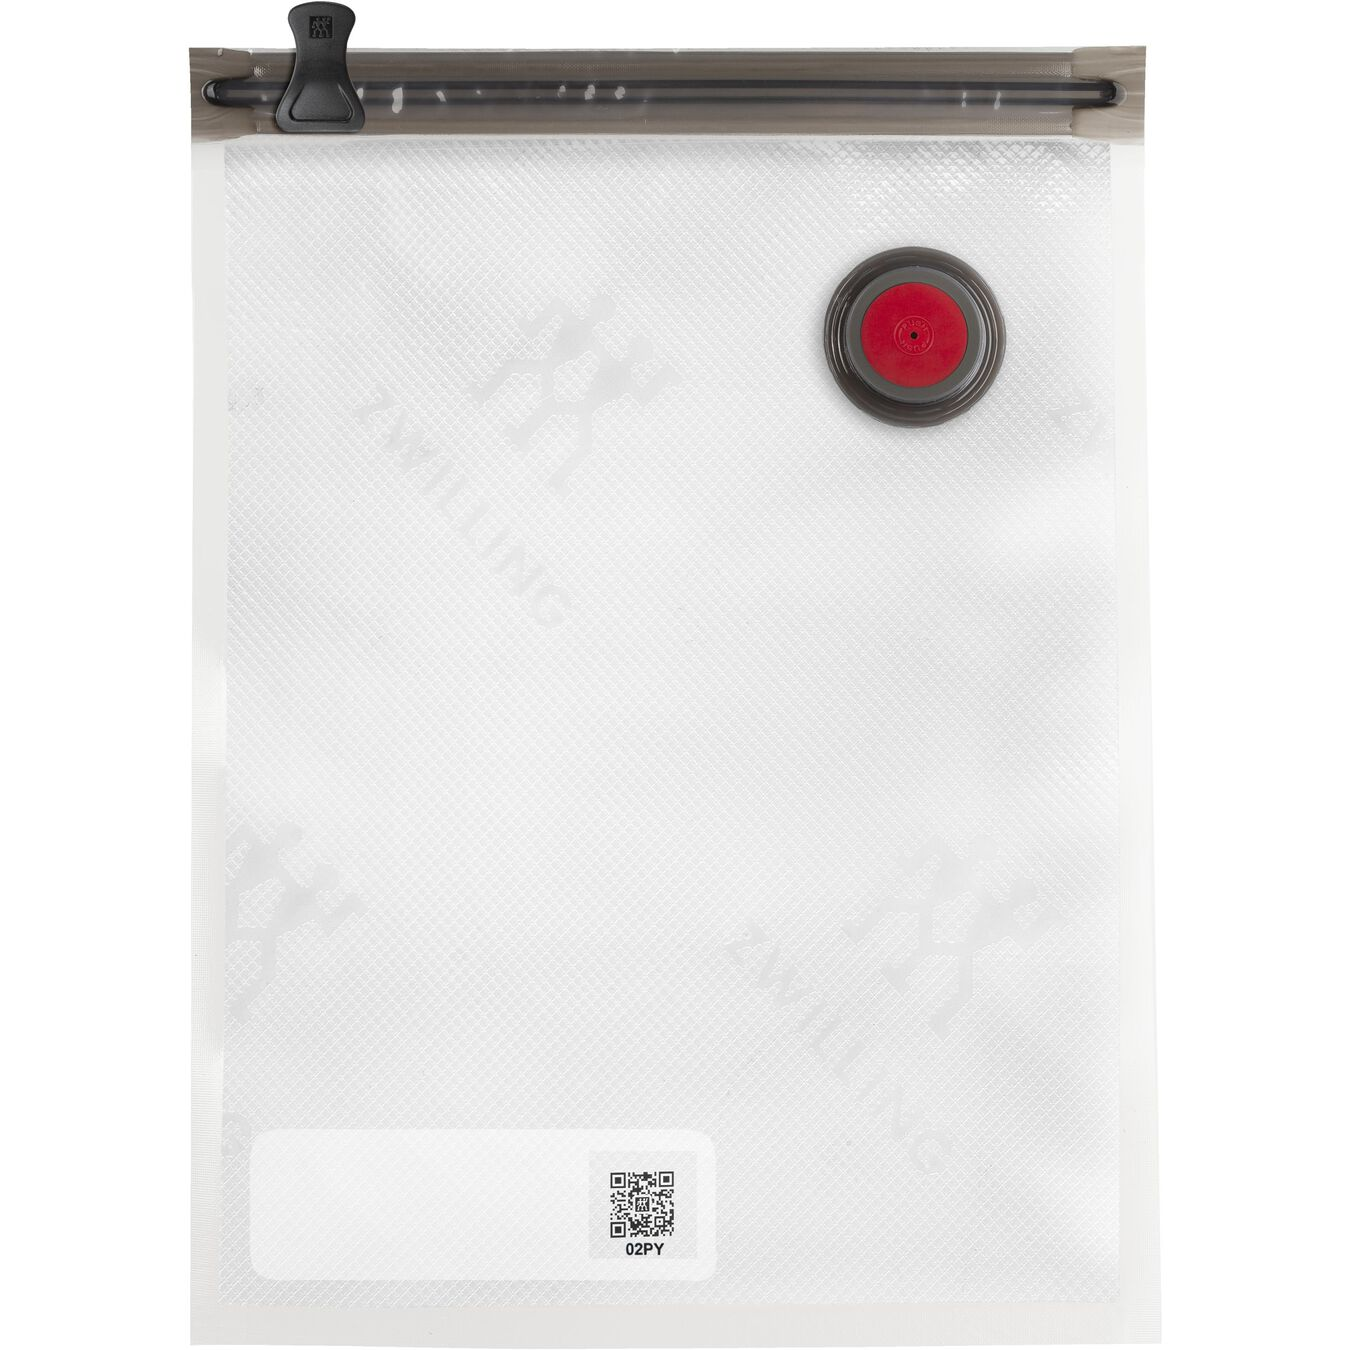 Primo set sottovuoto - plastica / M/L, 7-pz.,,large 6